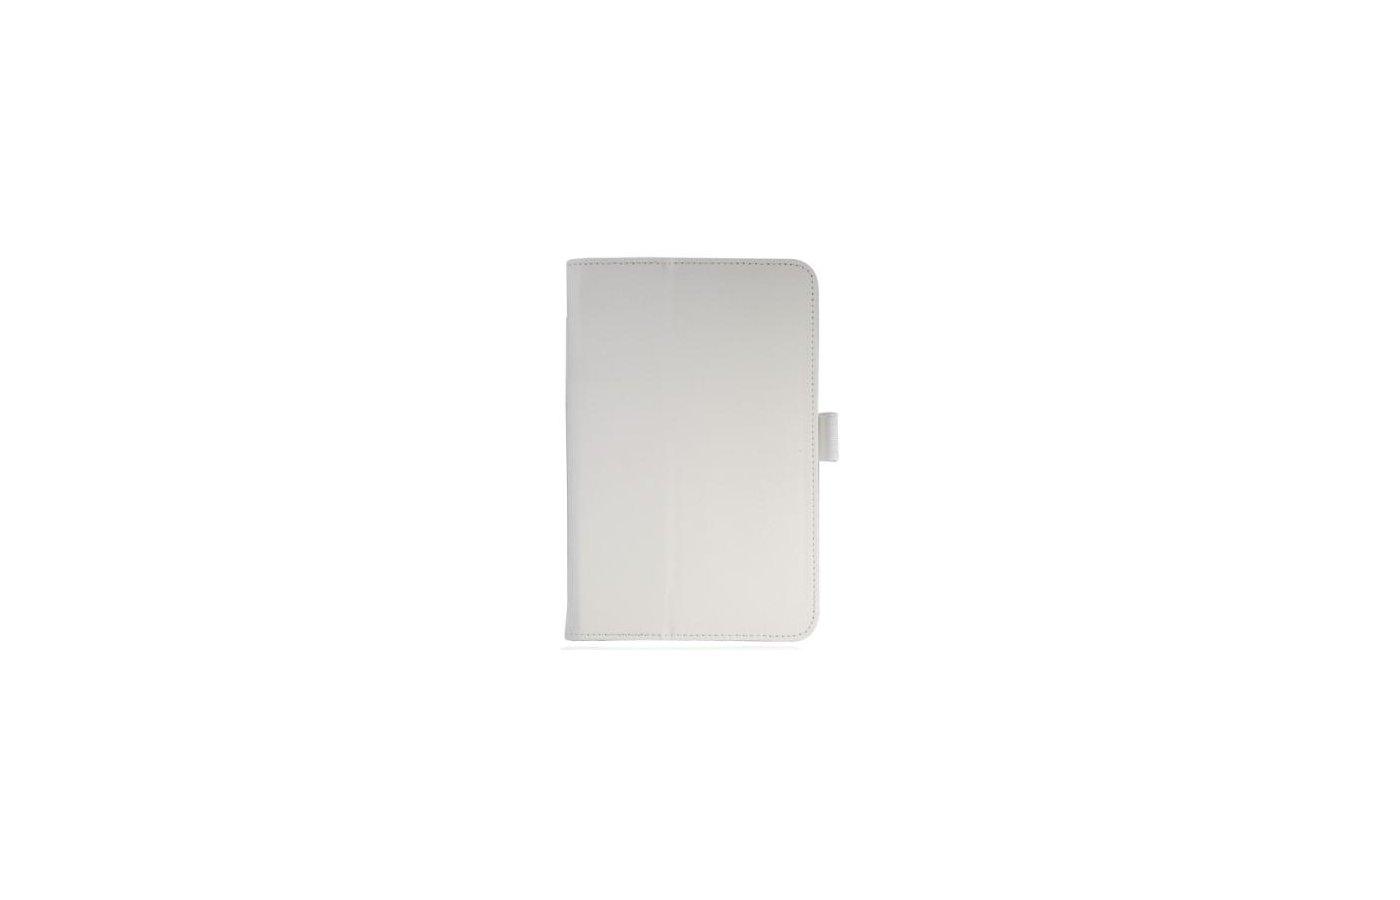 Чехол для планшетного ПК IT BAGGAGE для LENOVO Idea Tab A8-50 (A5500) 8 искус. кожа белый ITLNA5502-0